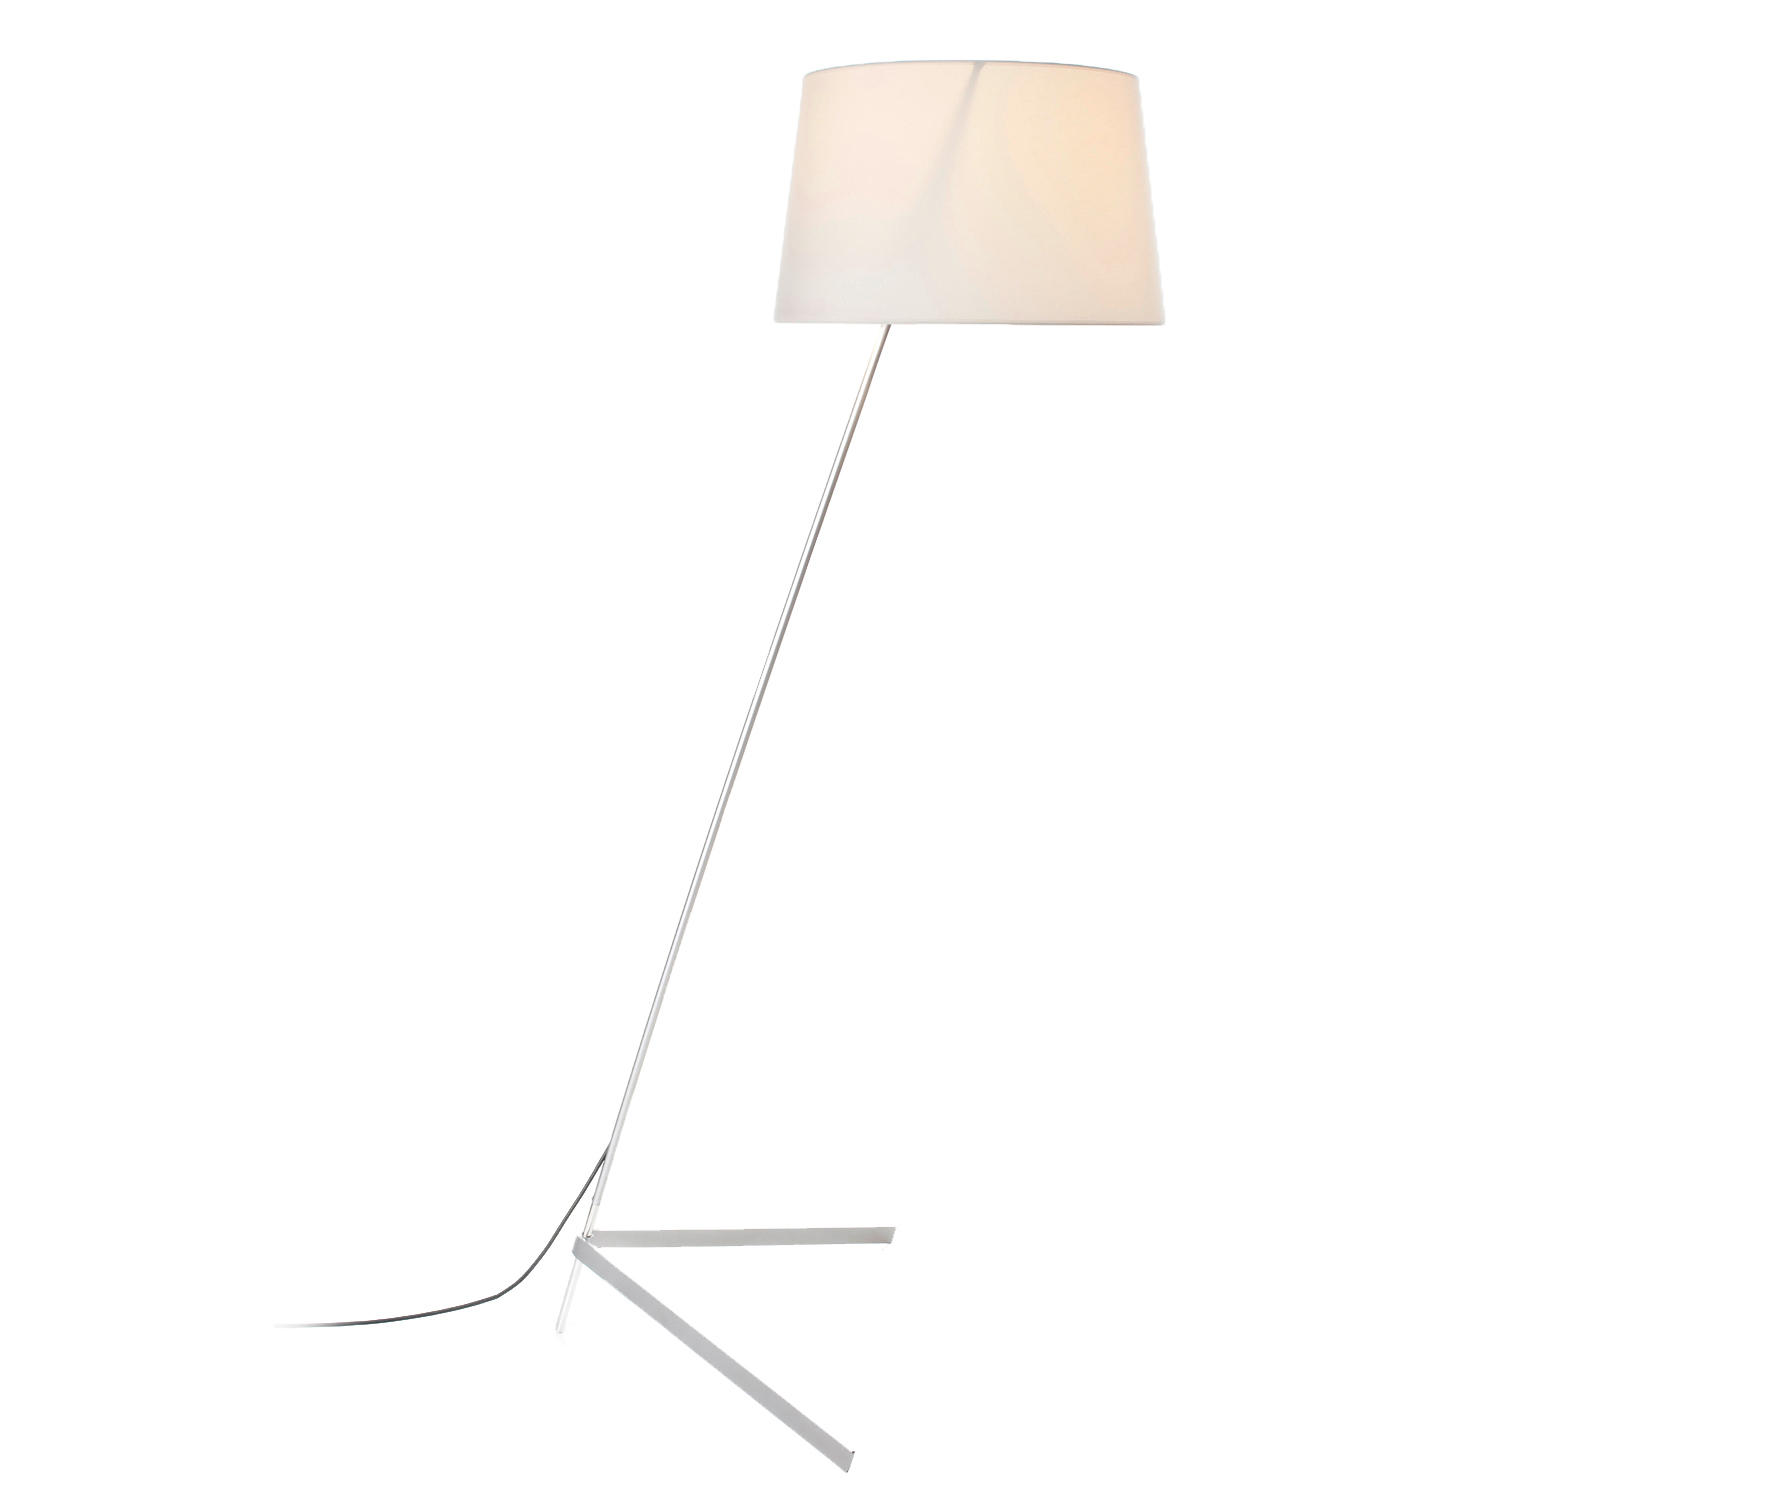 Steng Licht stick general lighting from steng licht architonic